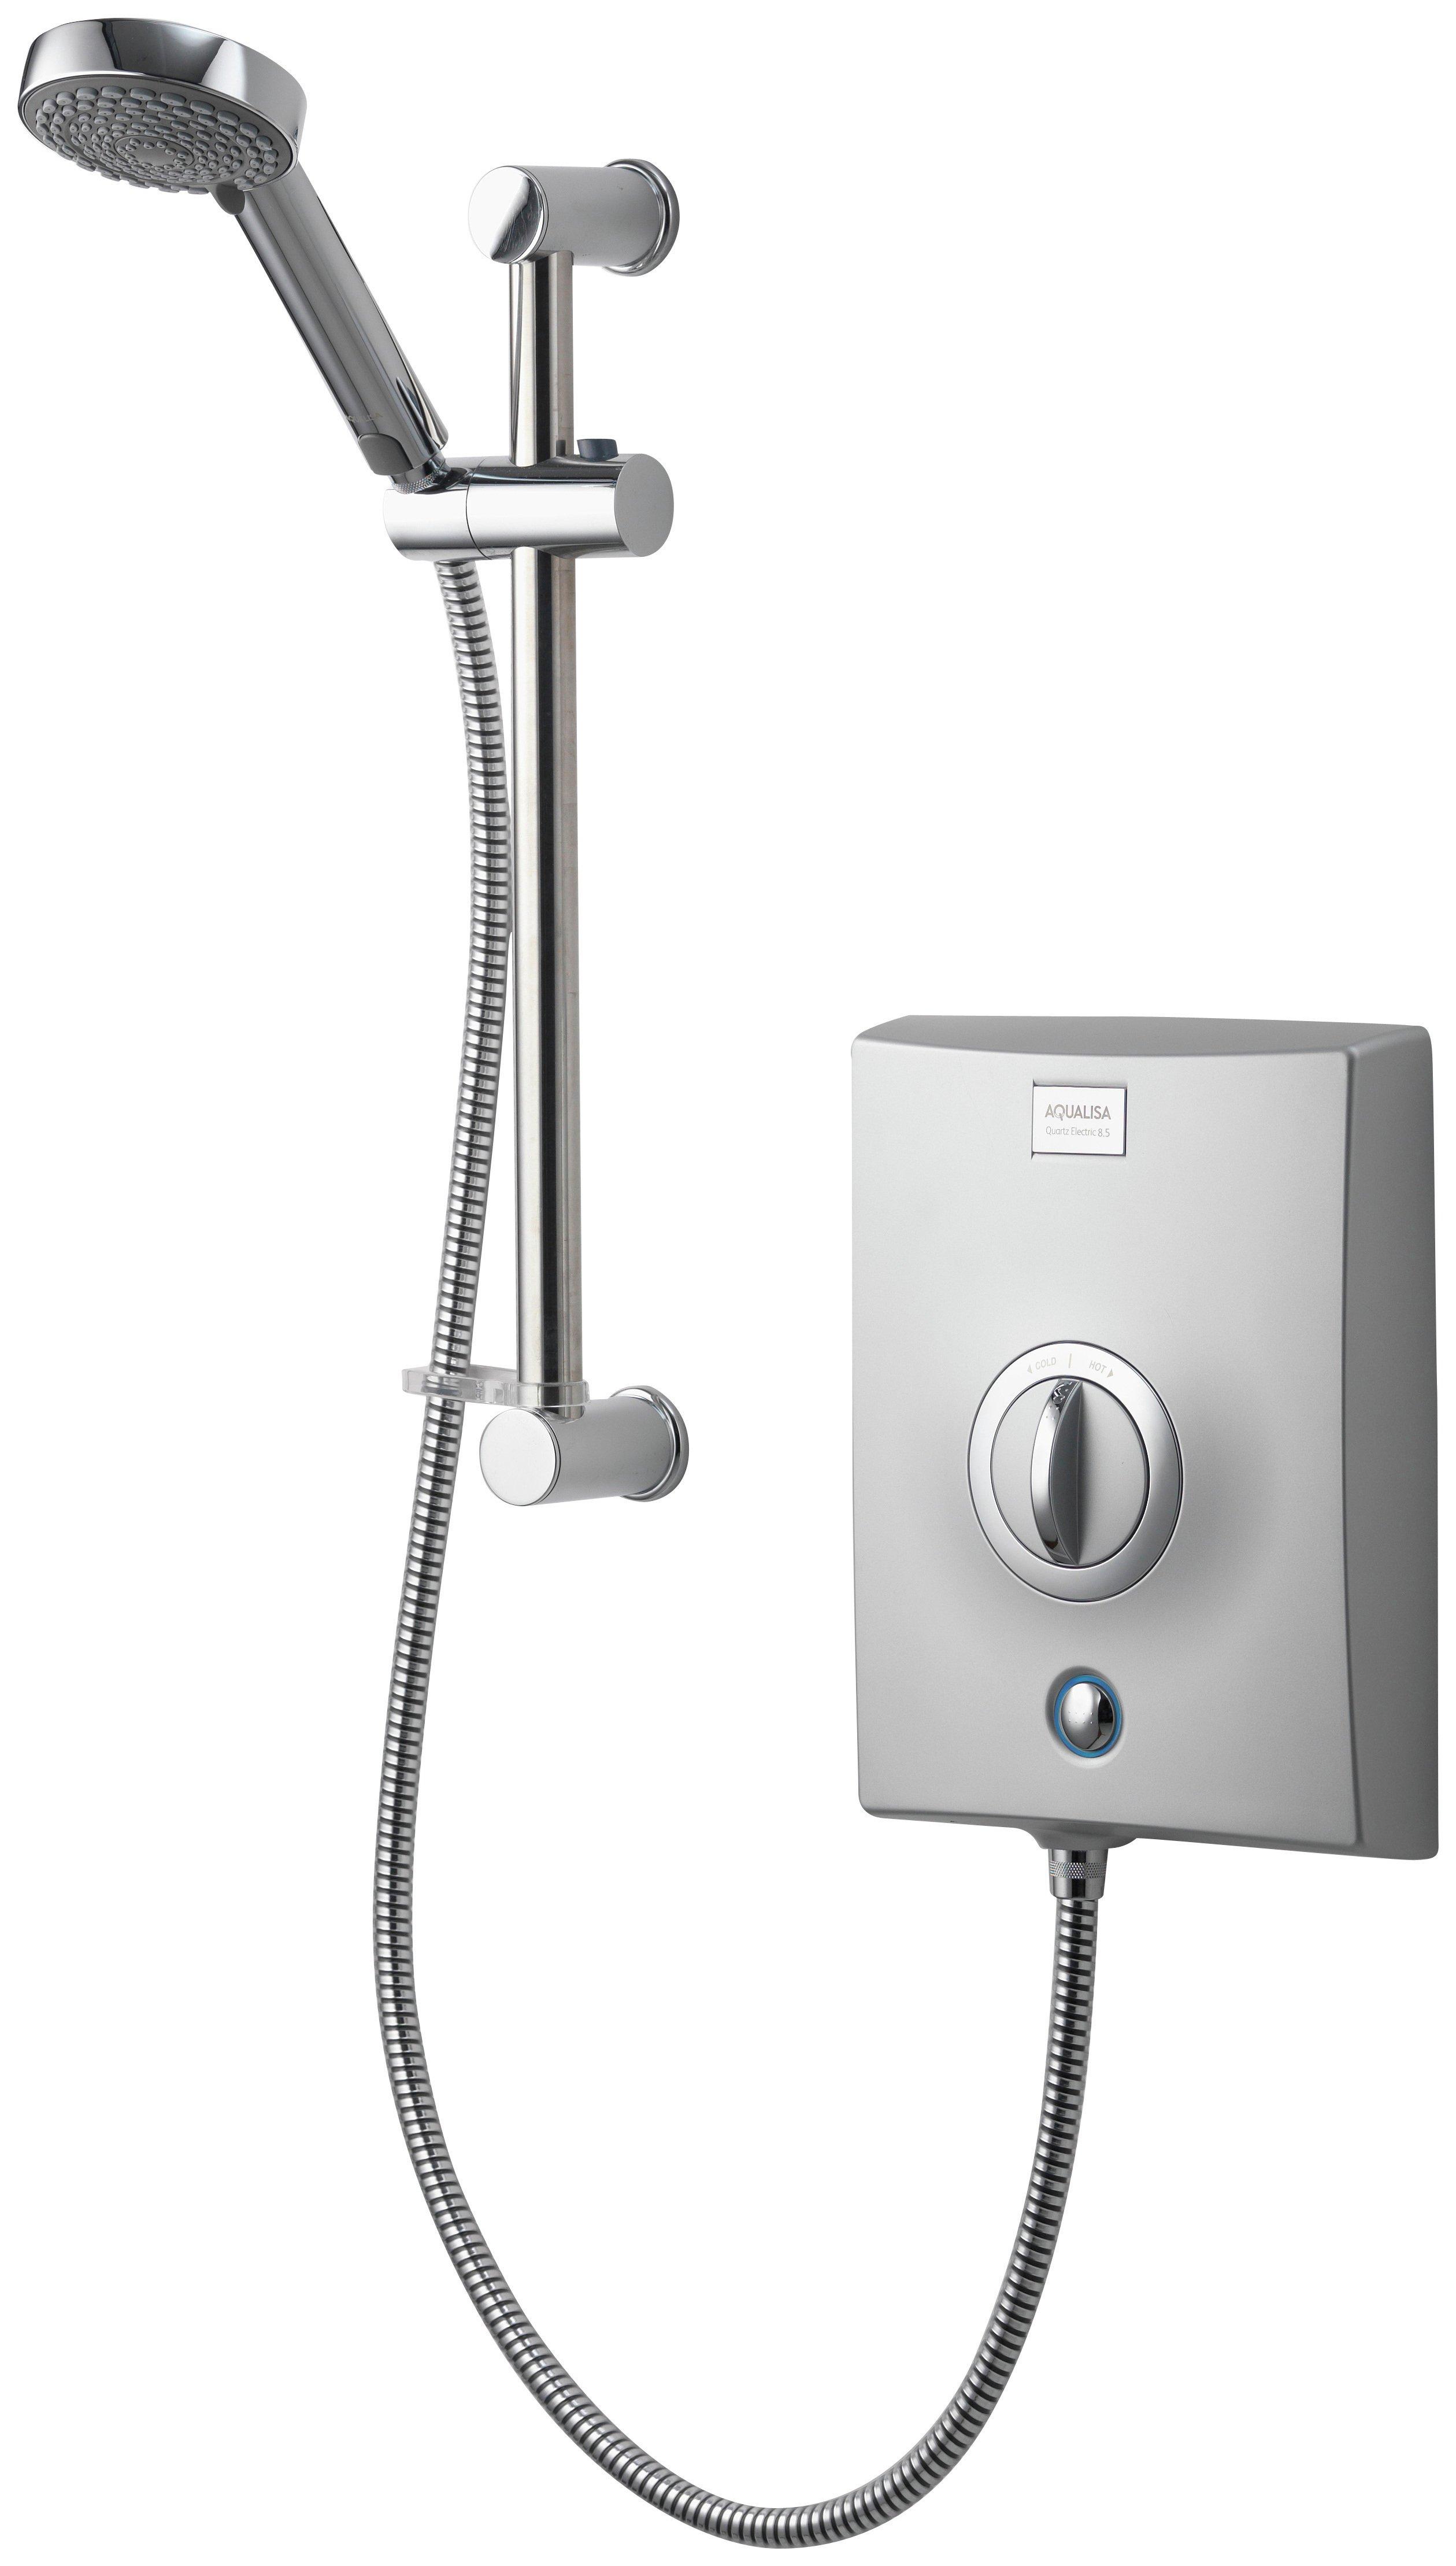 aqualisa quartz electric shower 85kw